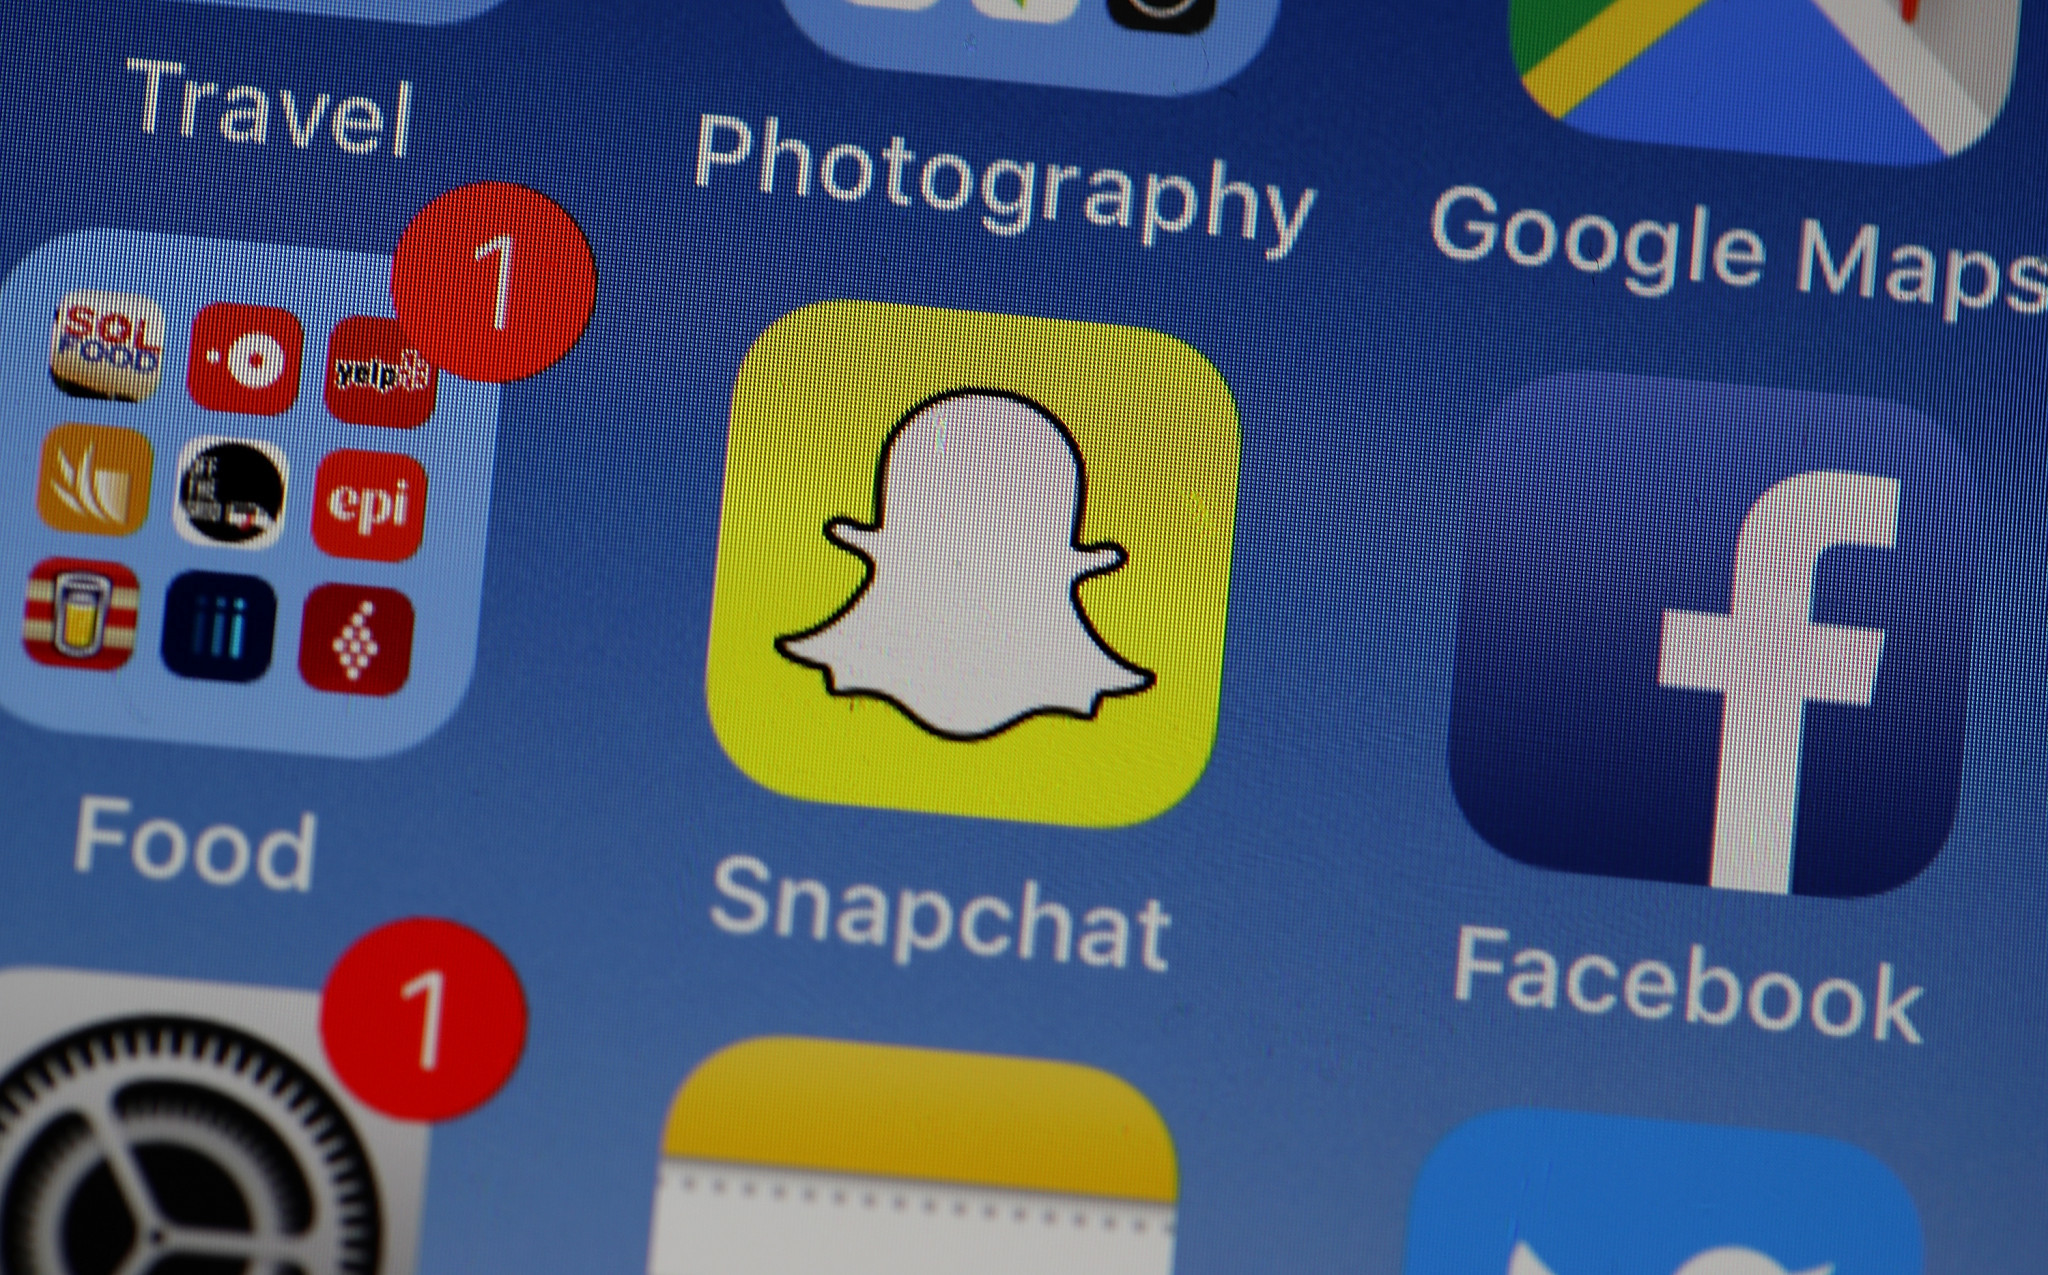 NBC renews Snapchat partnership for Tokyo 2020